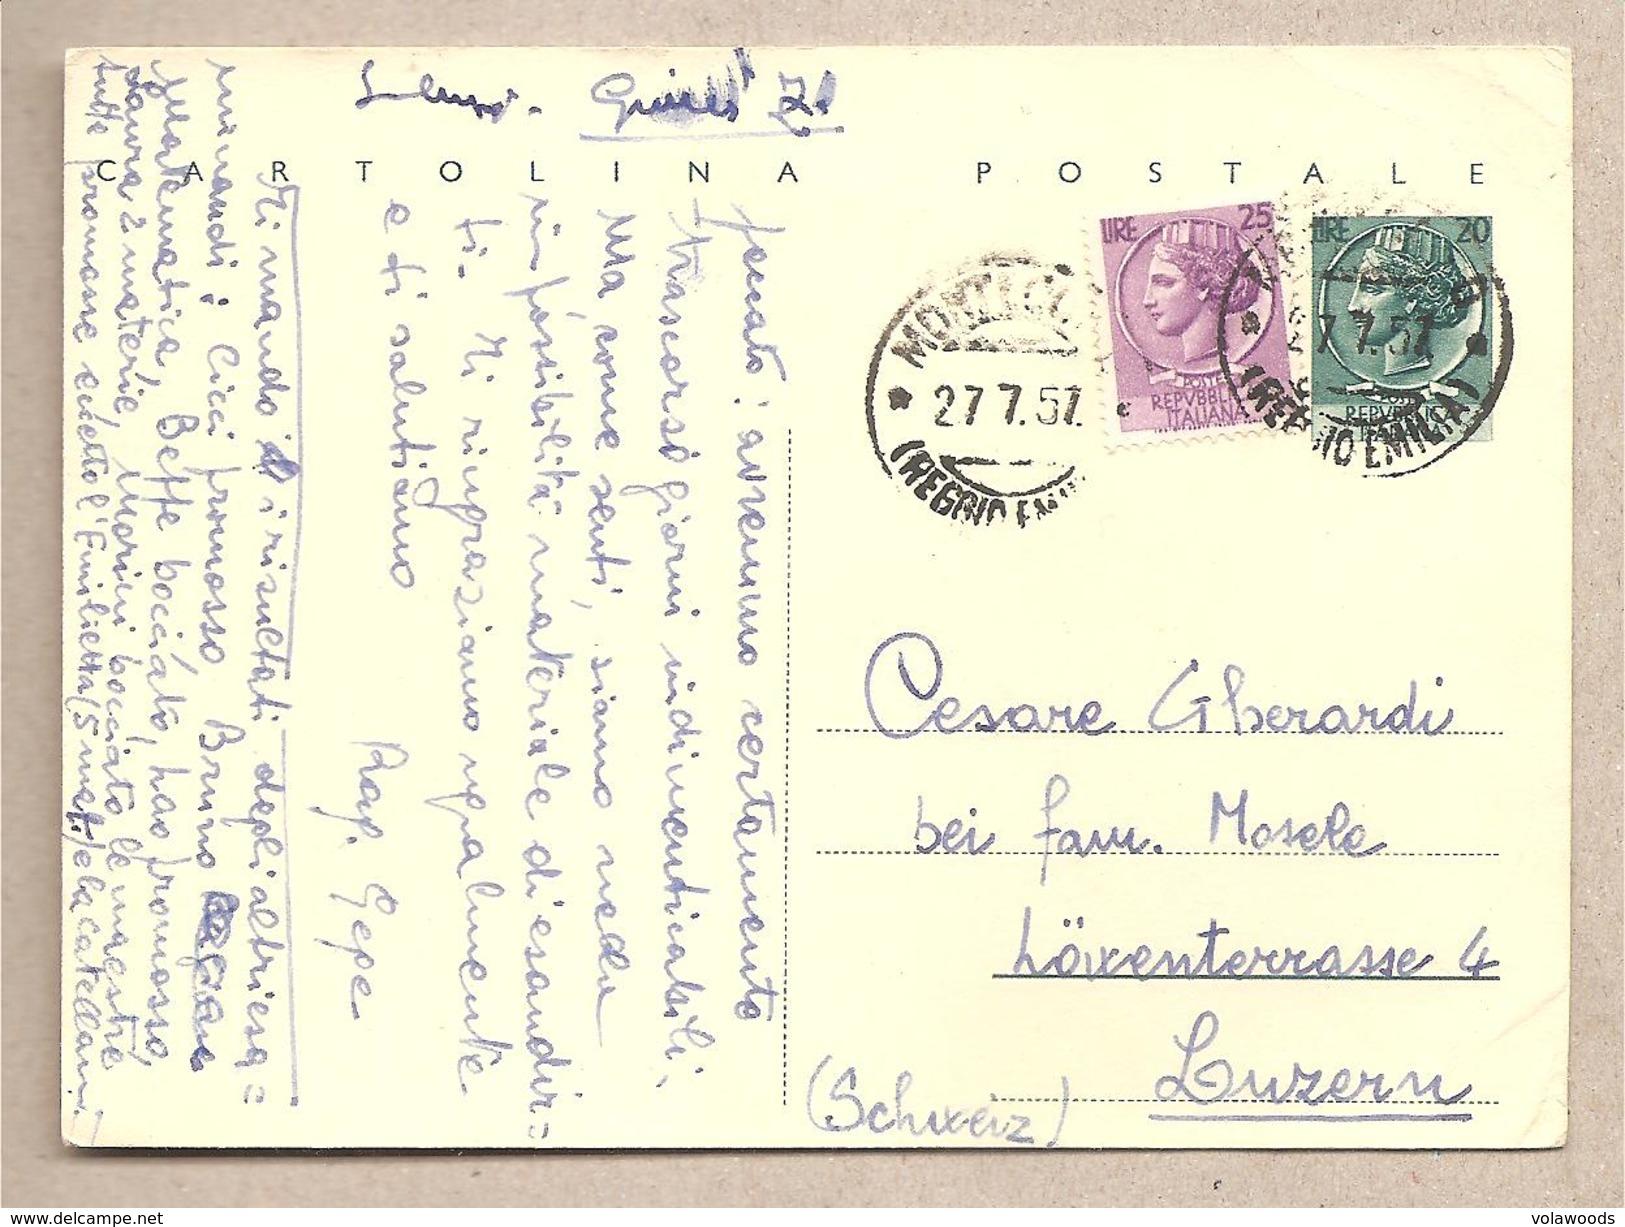 "Italia - Cartolina Postale  ""siracusana Testo Lungo"" Usata Per L'estero - 1954 - Stamped Stationery"